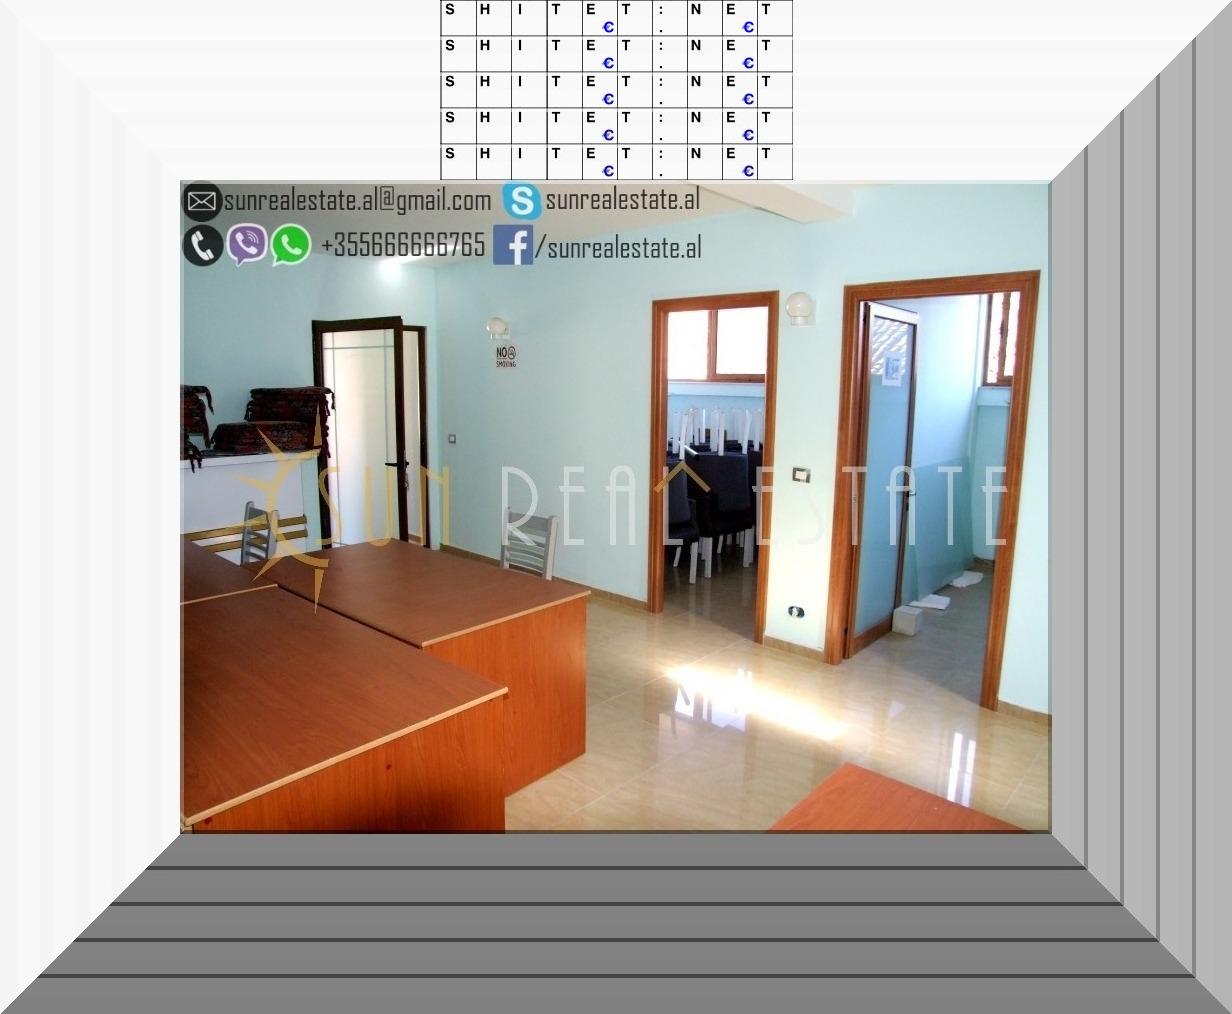 Ambient sherbimi/zyra me qera